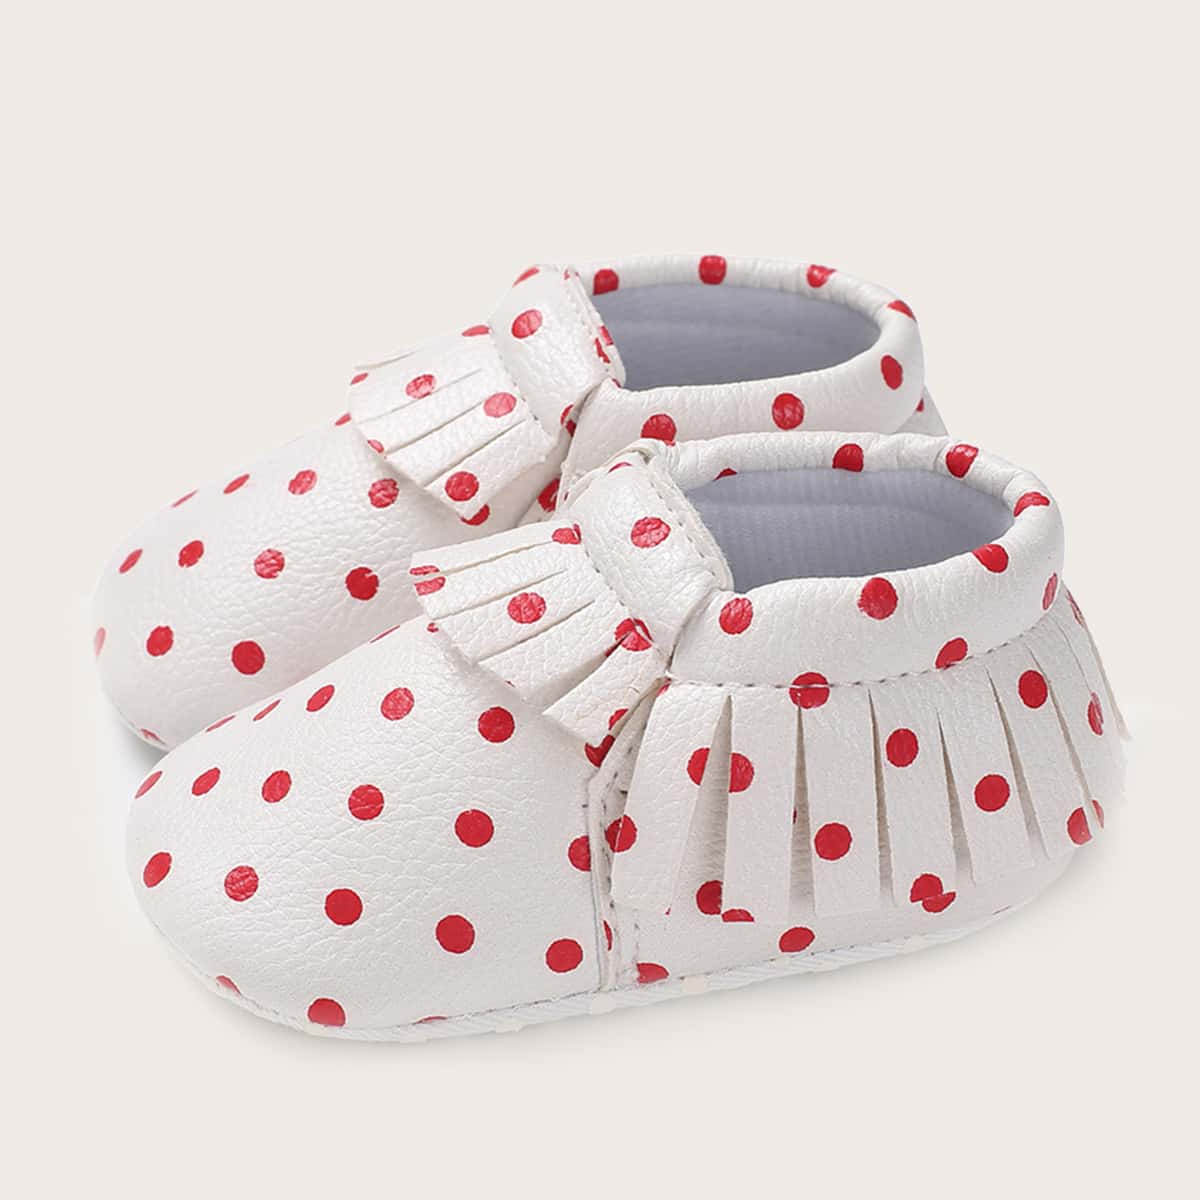 SHEIN Baby Girl Polka Dot Fringe Trim Flats